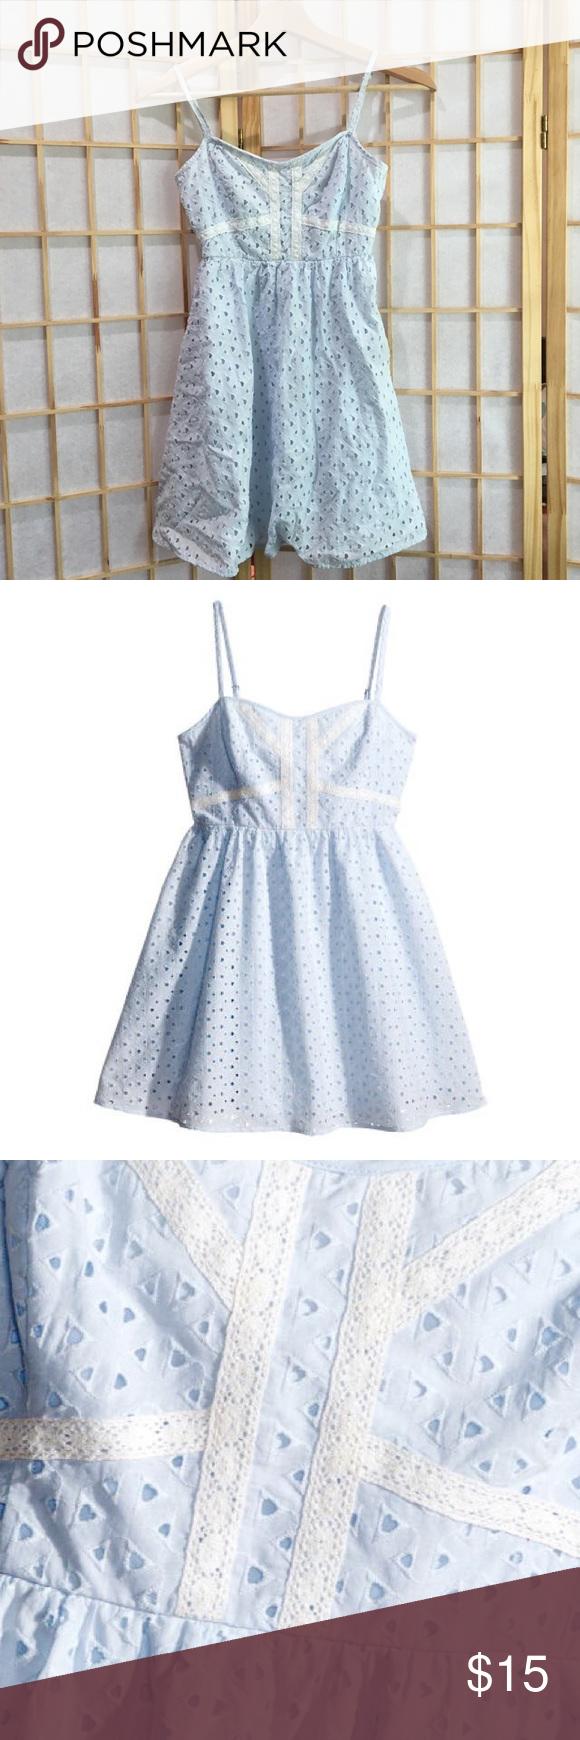 H&m blue lace dress  Hum eyelet lace baby blue dress  My Posh Picks  Pinterest